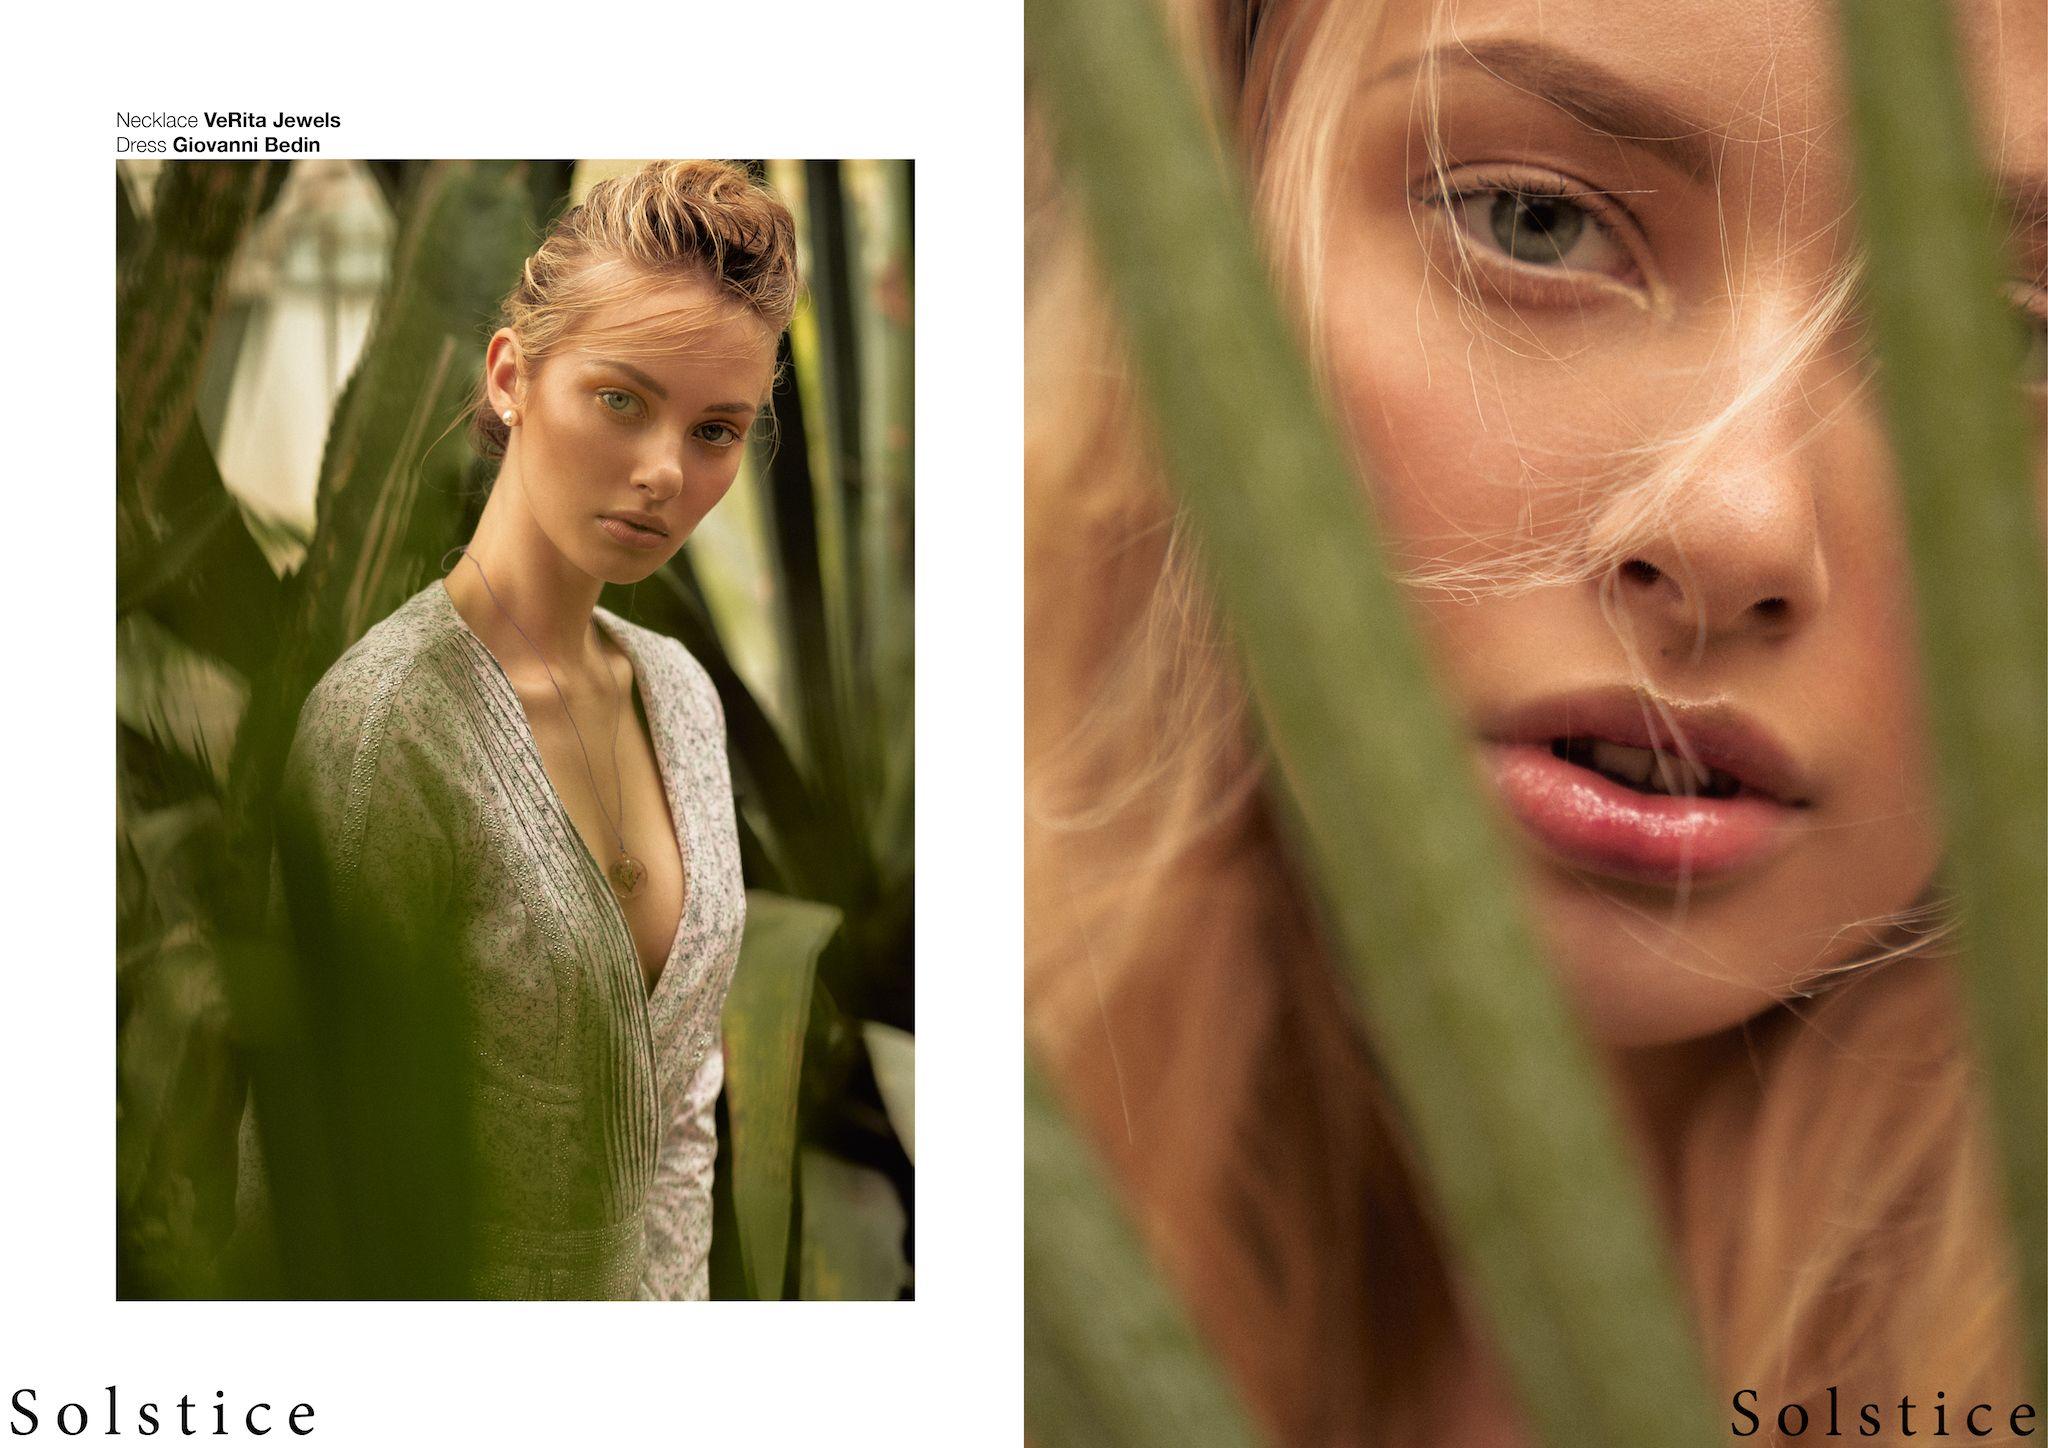 Garden of Eden - Solstice Magazine UK - Pic. 4